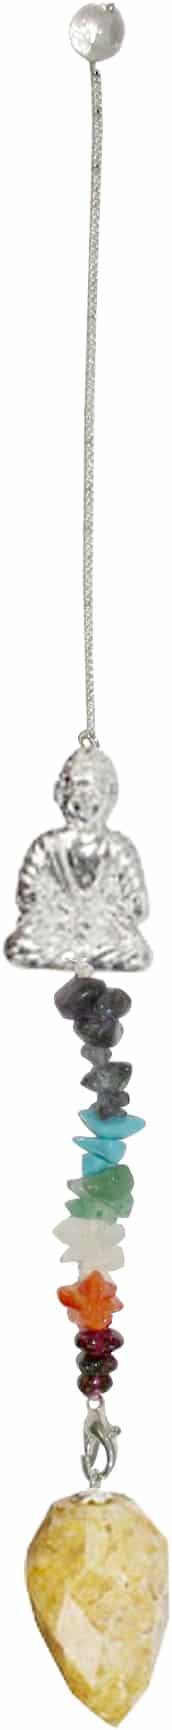 Pendel Edelsteen Chakra Boeddha